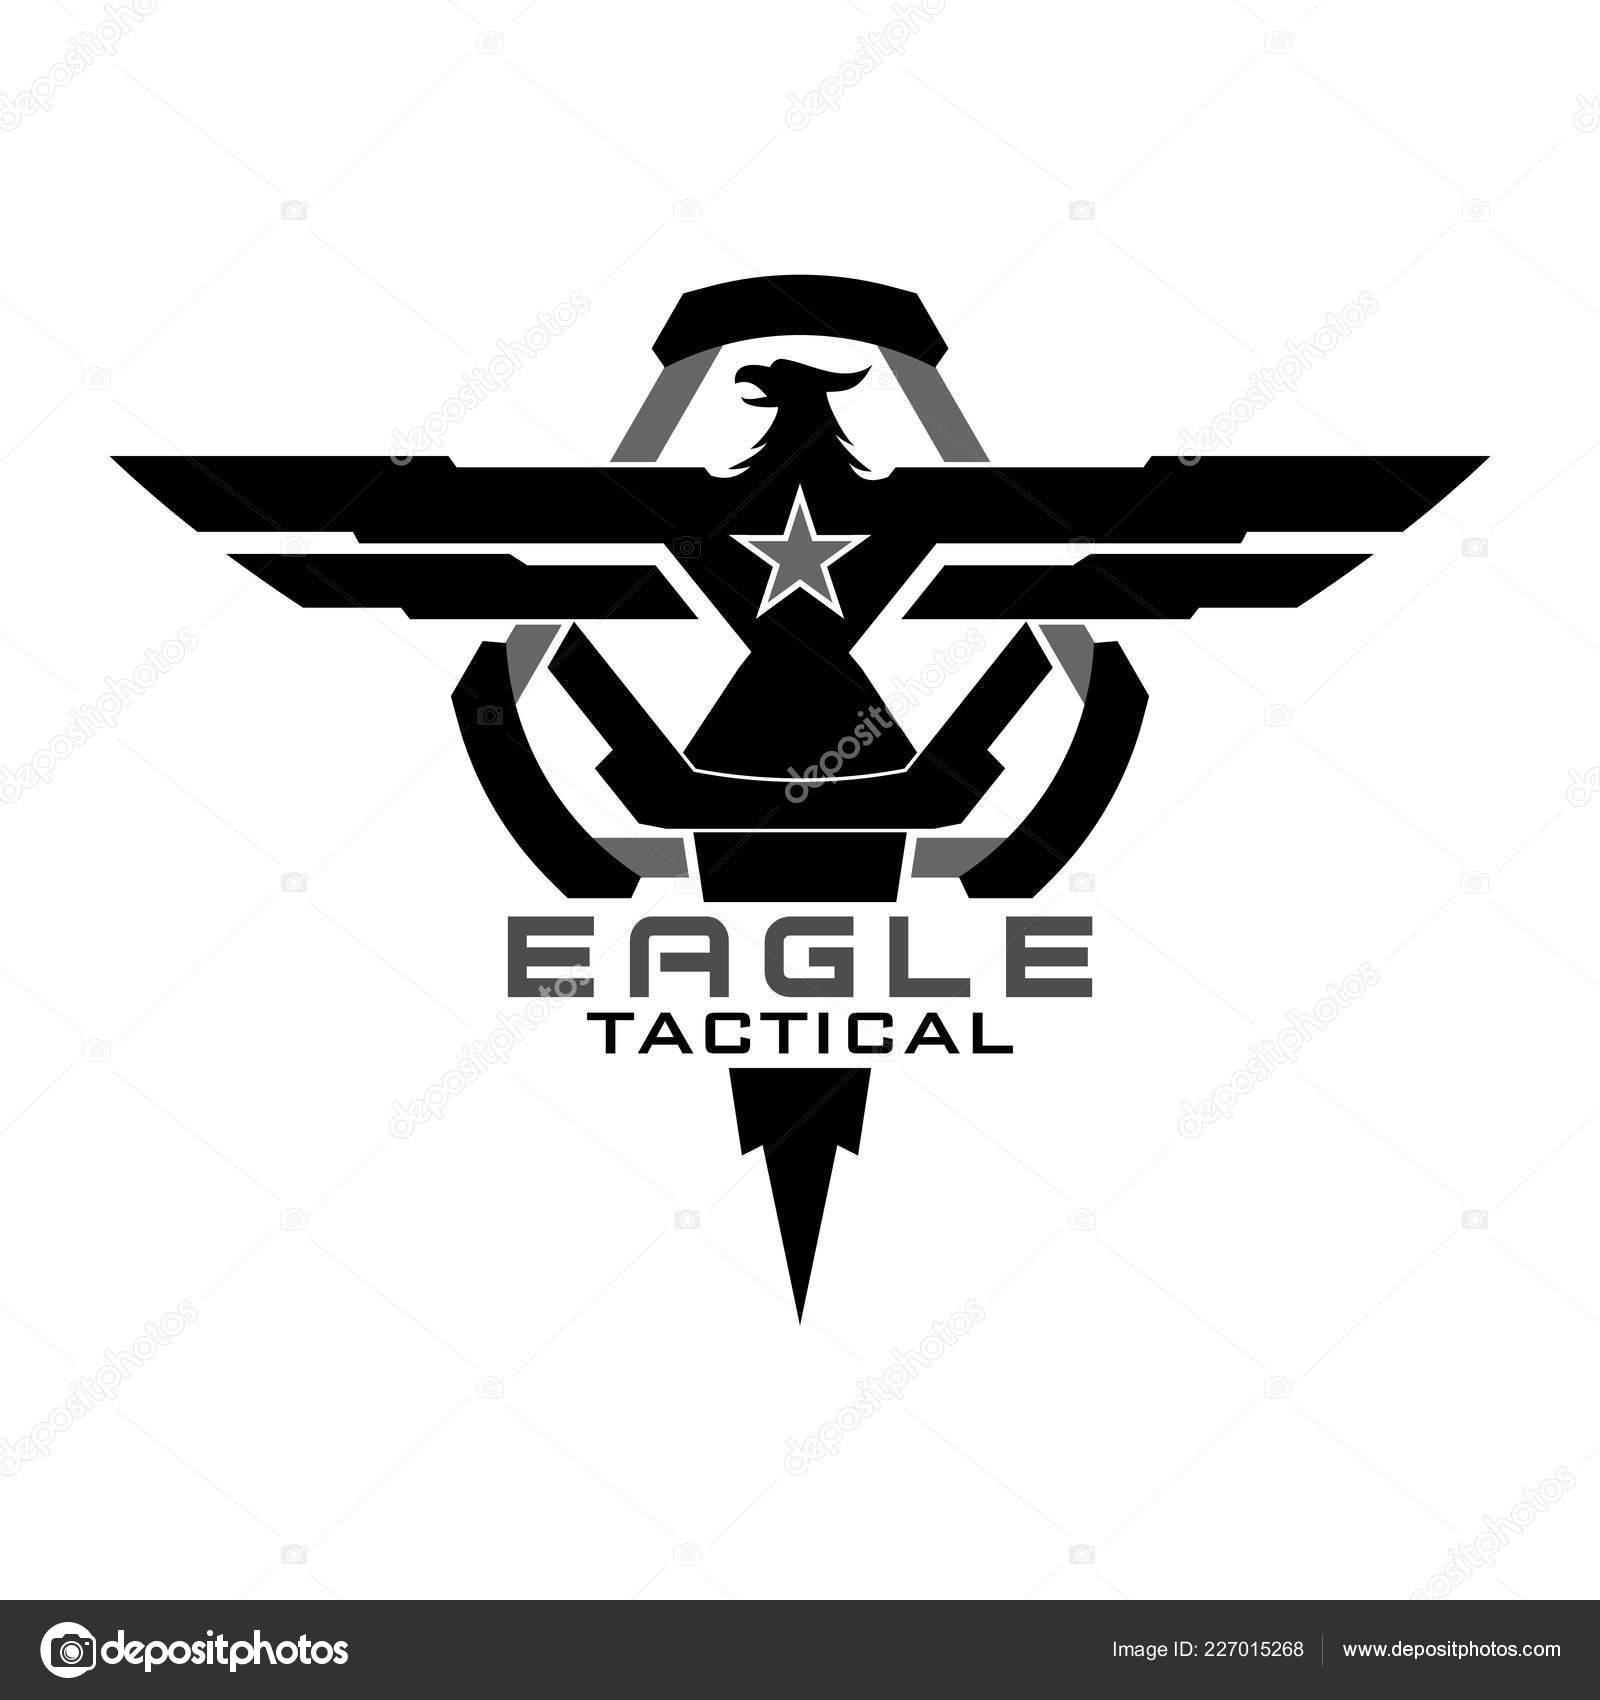 Eagle Tactical Logo Design Illustration — Stock Vector